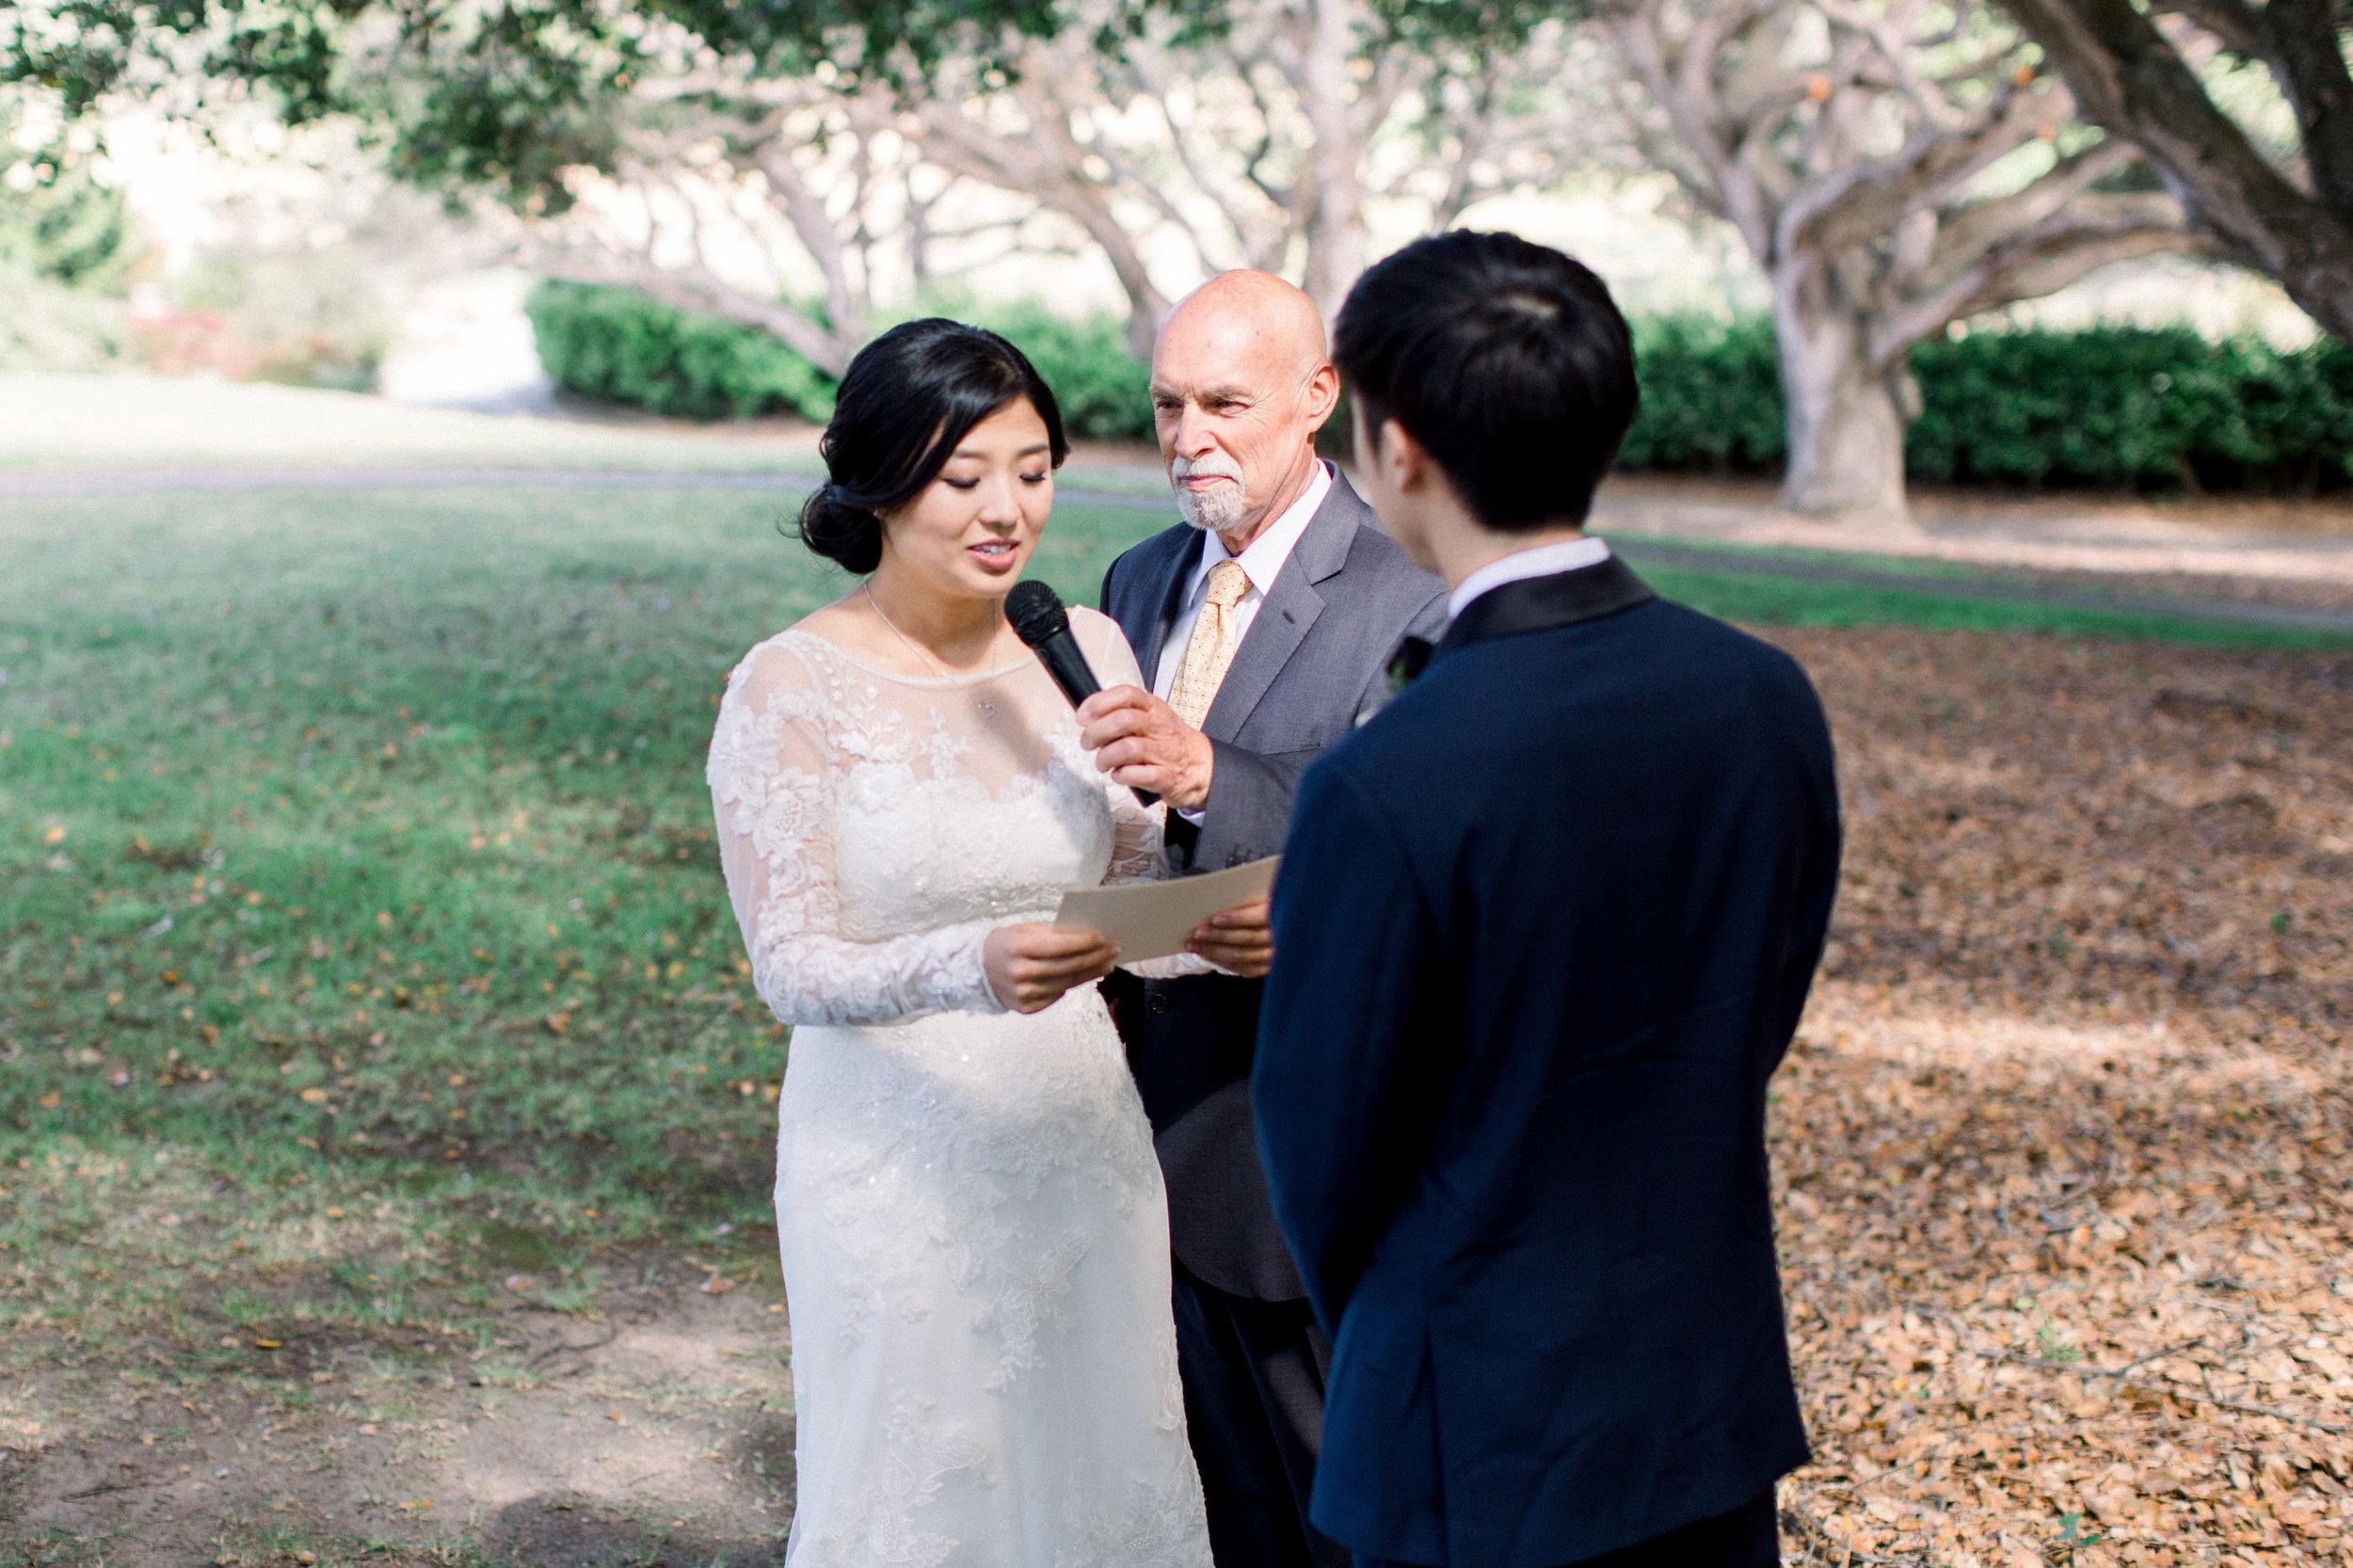 Cliffside-Carmel-valley-wedding-by-kristine-herman-photography-13.jpg